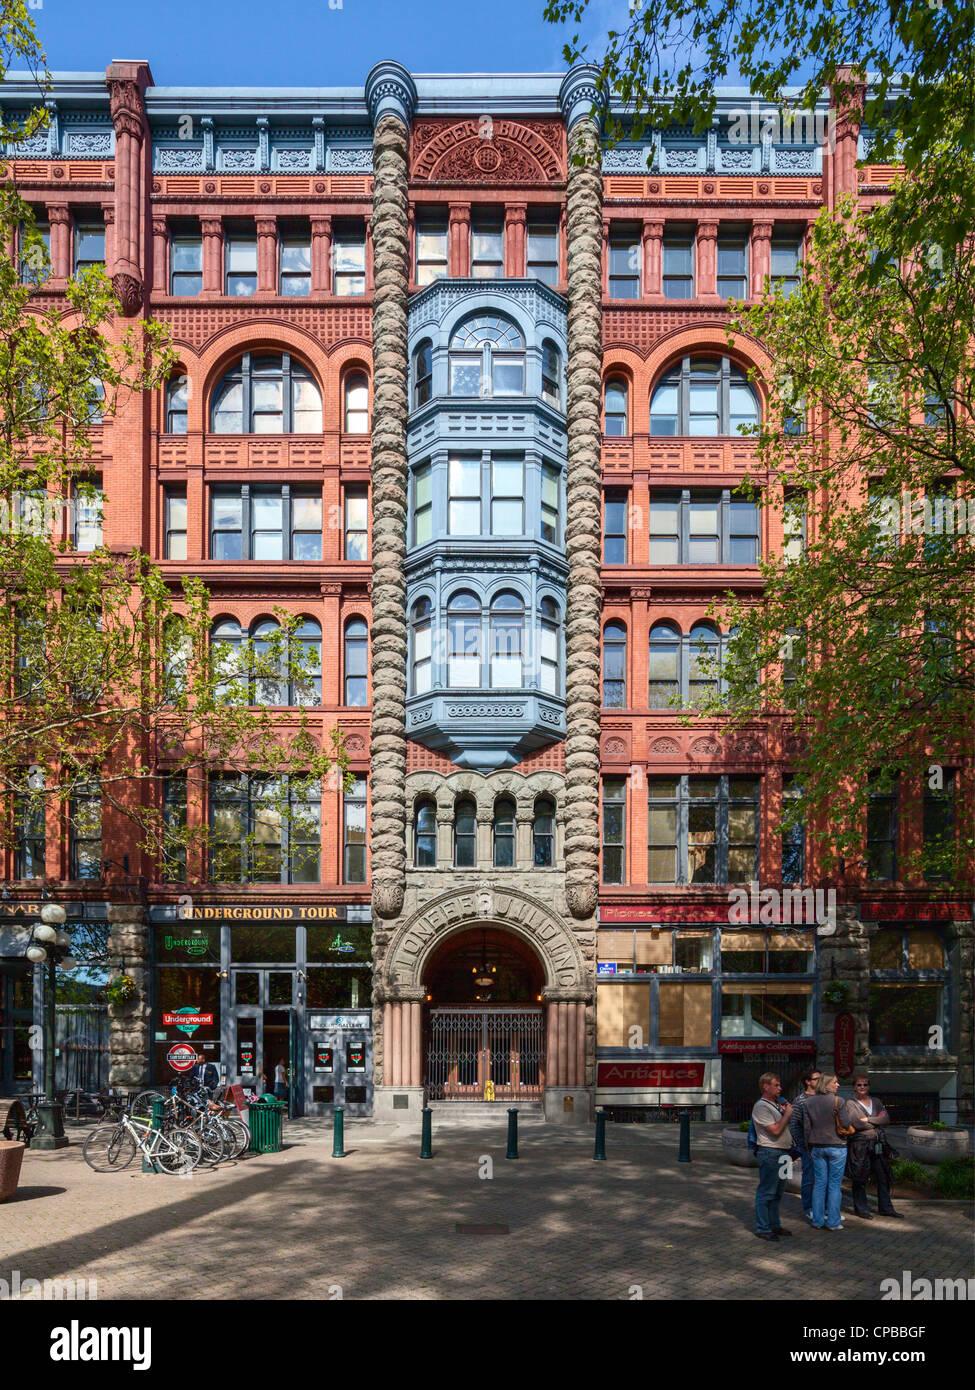 Pioneer Building, Seattle - Stock Image